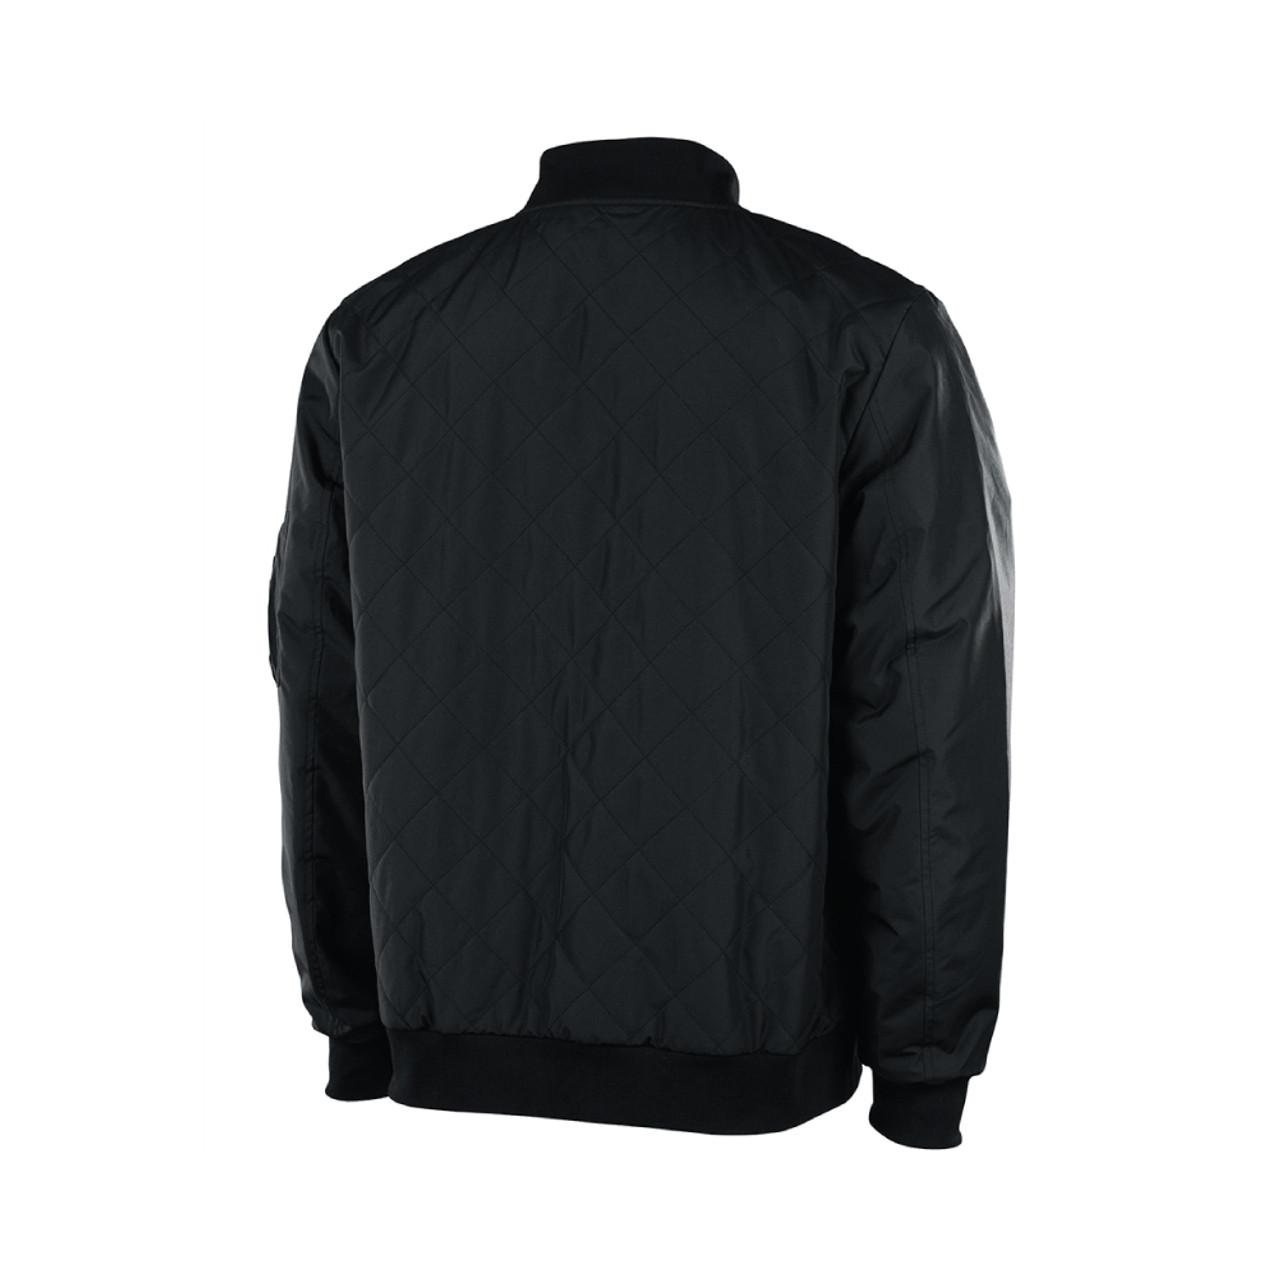 Mens Black Polyester Quilted Flight Jacket